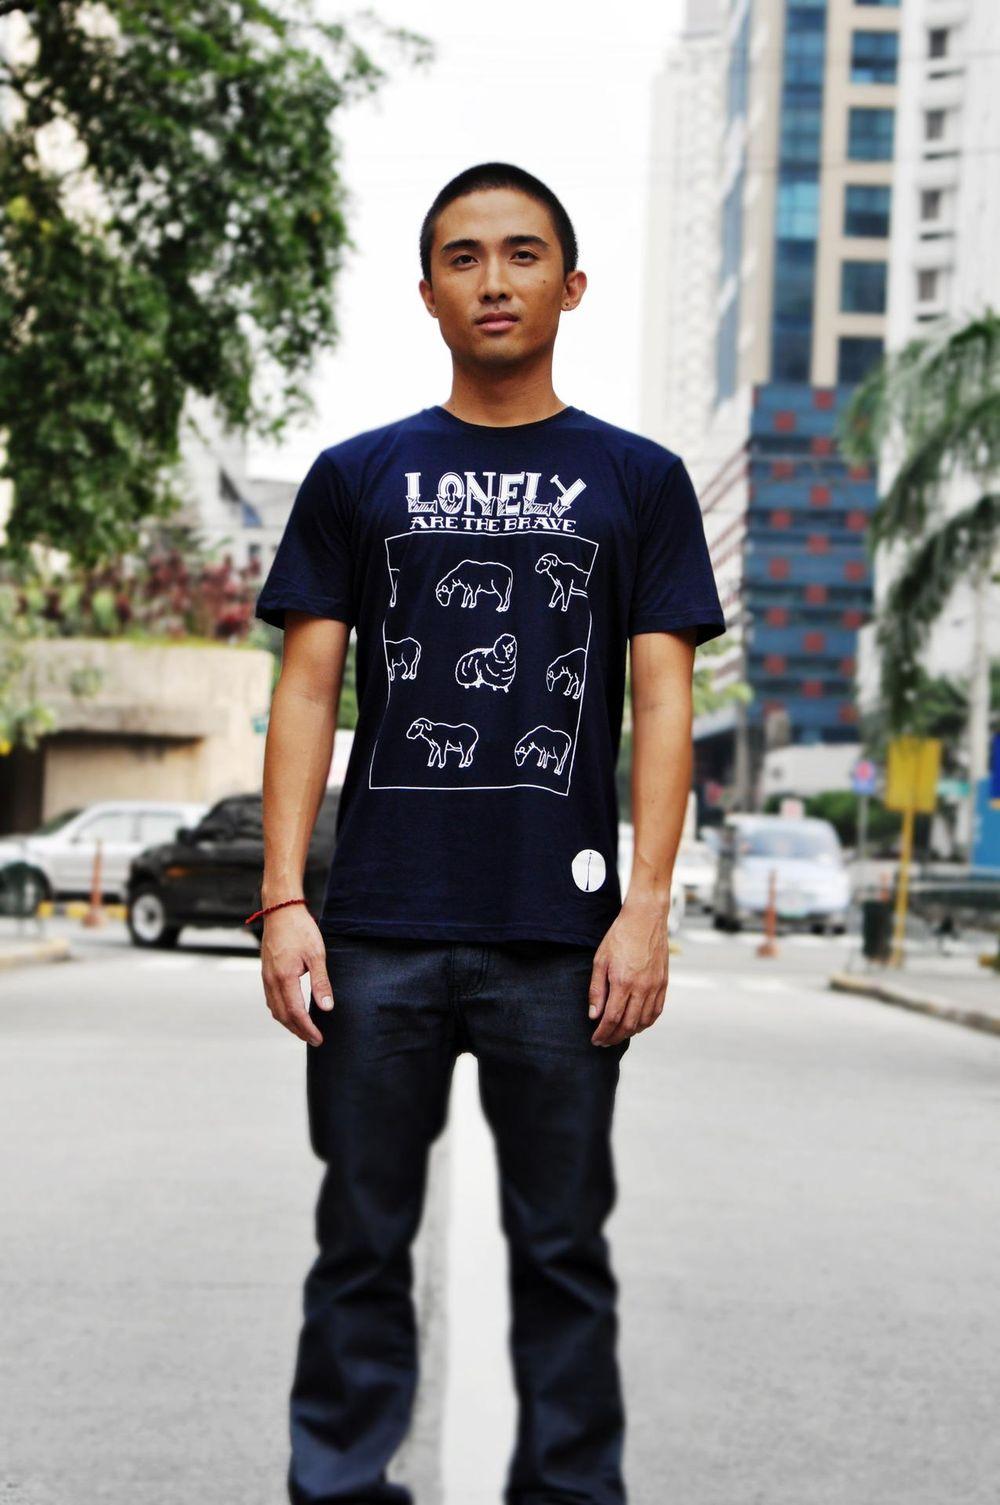 Liberty Street Clothing Company / Community - image 4 - student project